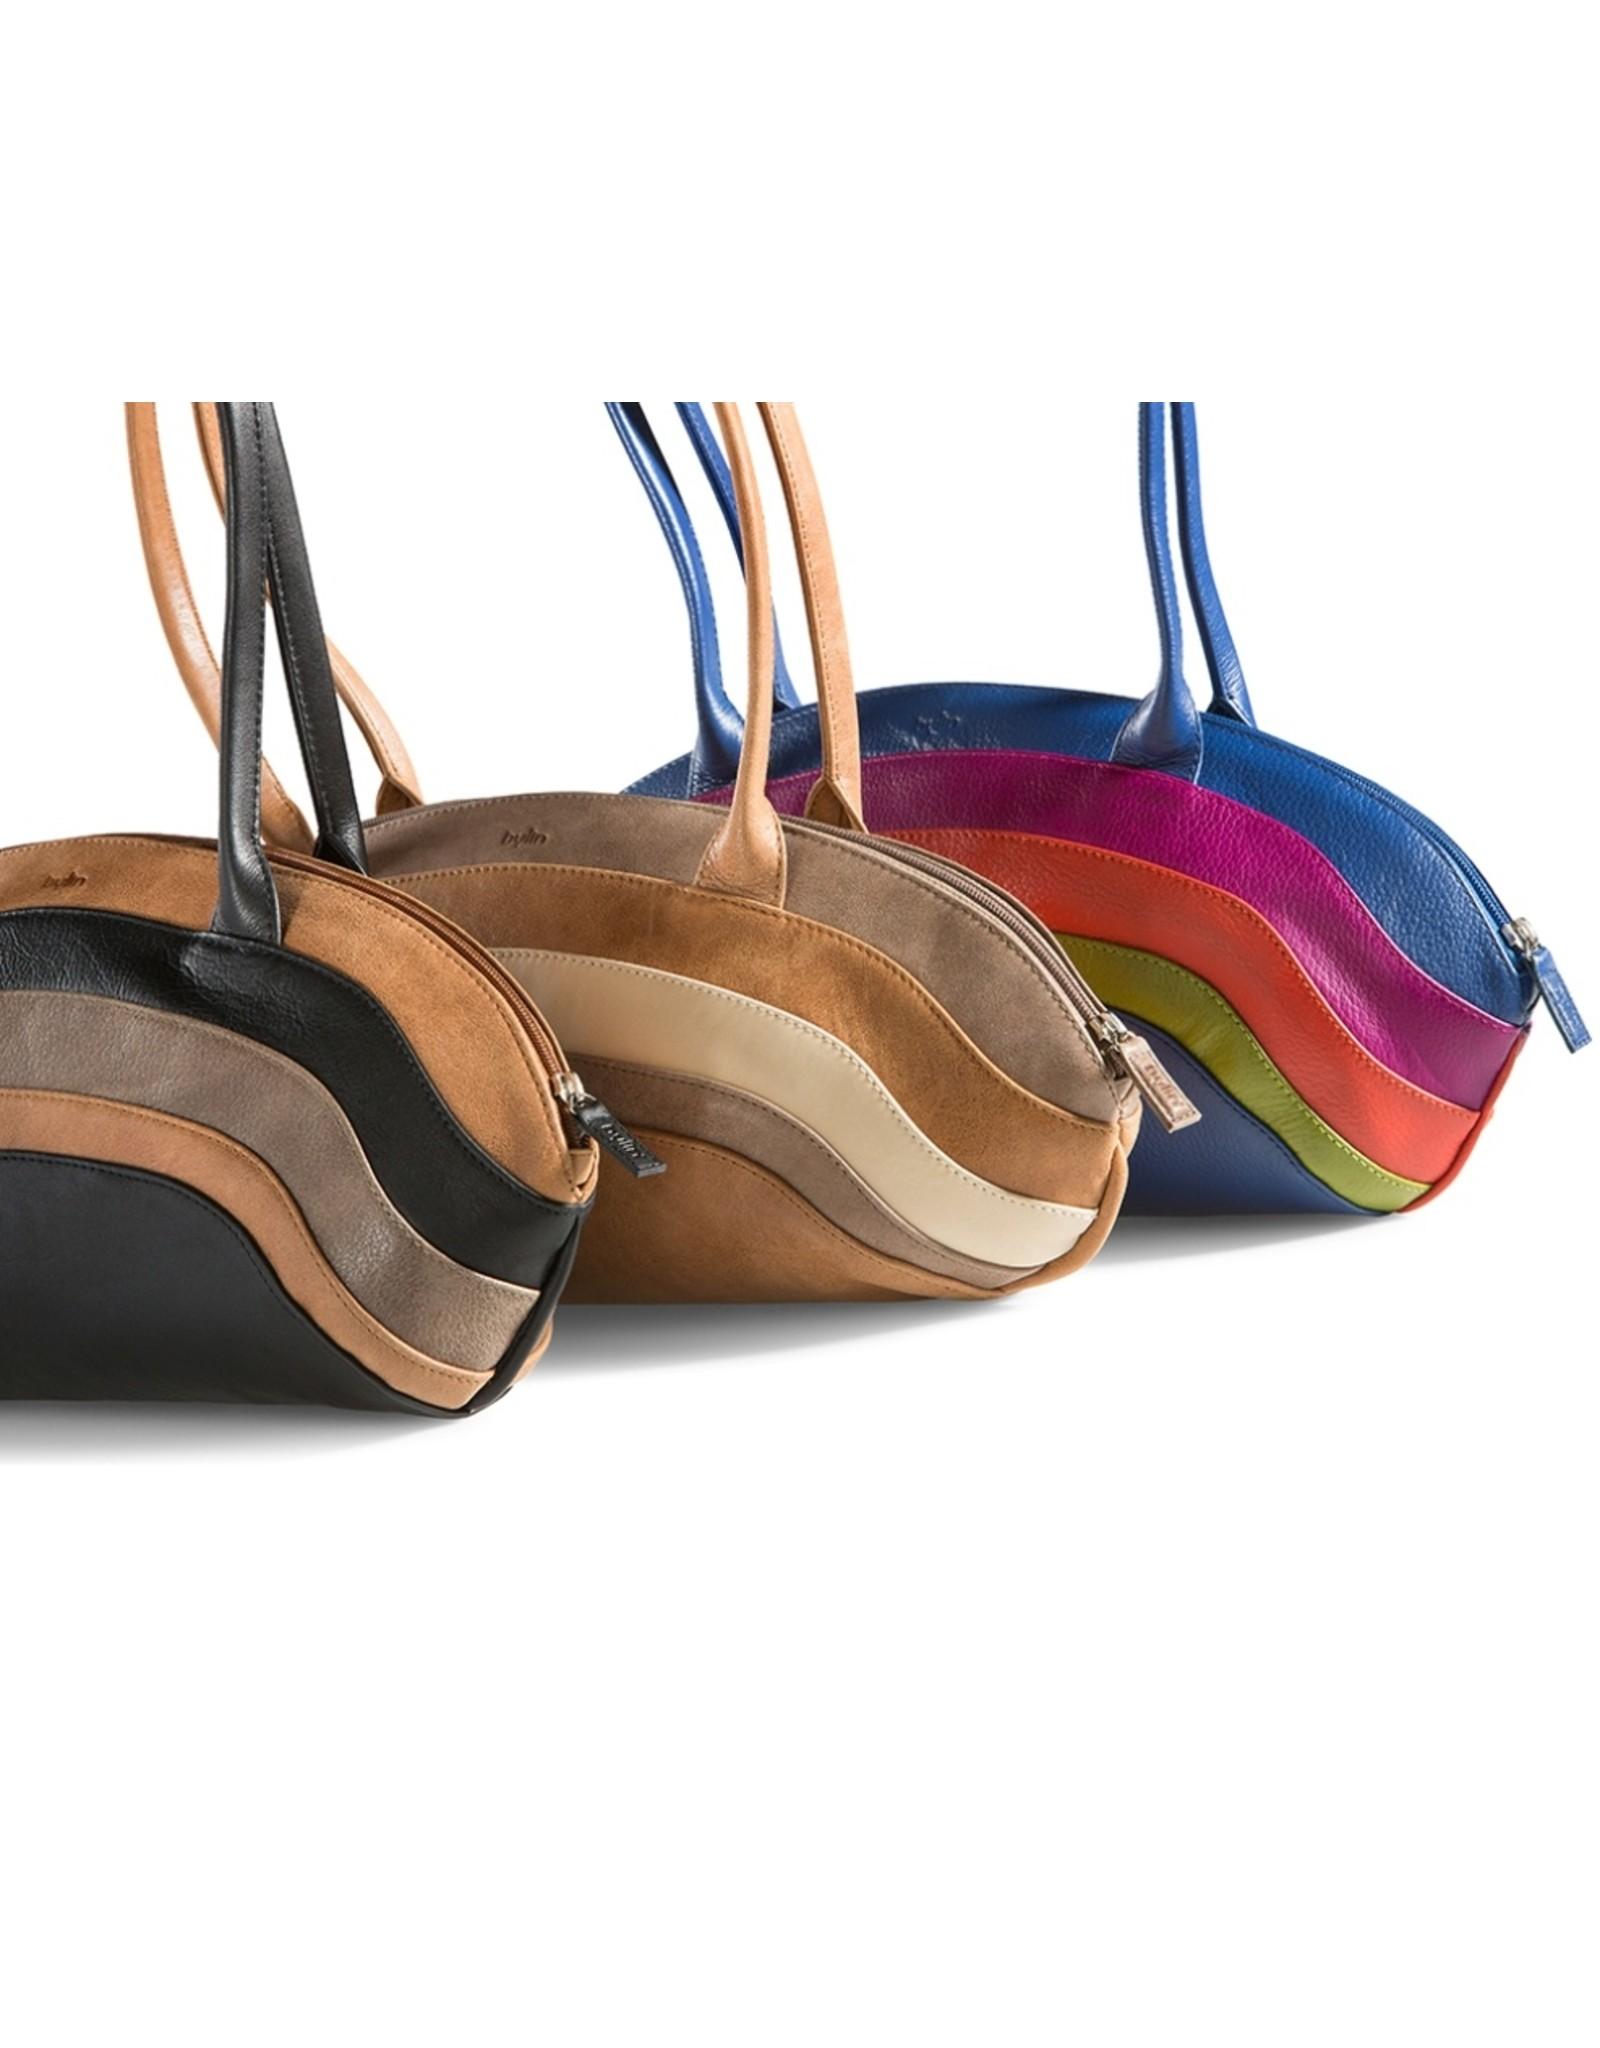 by-Lin Dutch Design Leather bags -by-Lin Dutch Design Rainbow leather shoulder bag